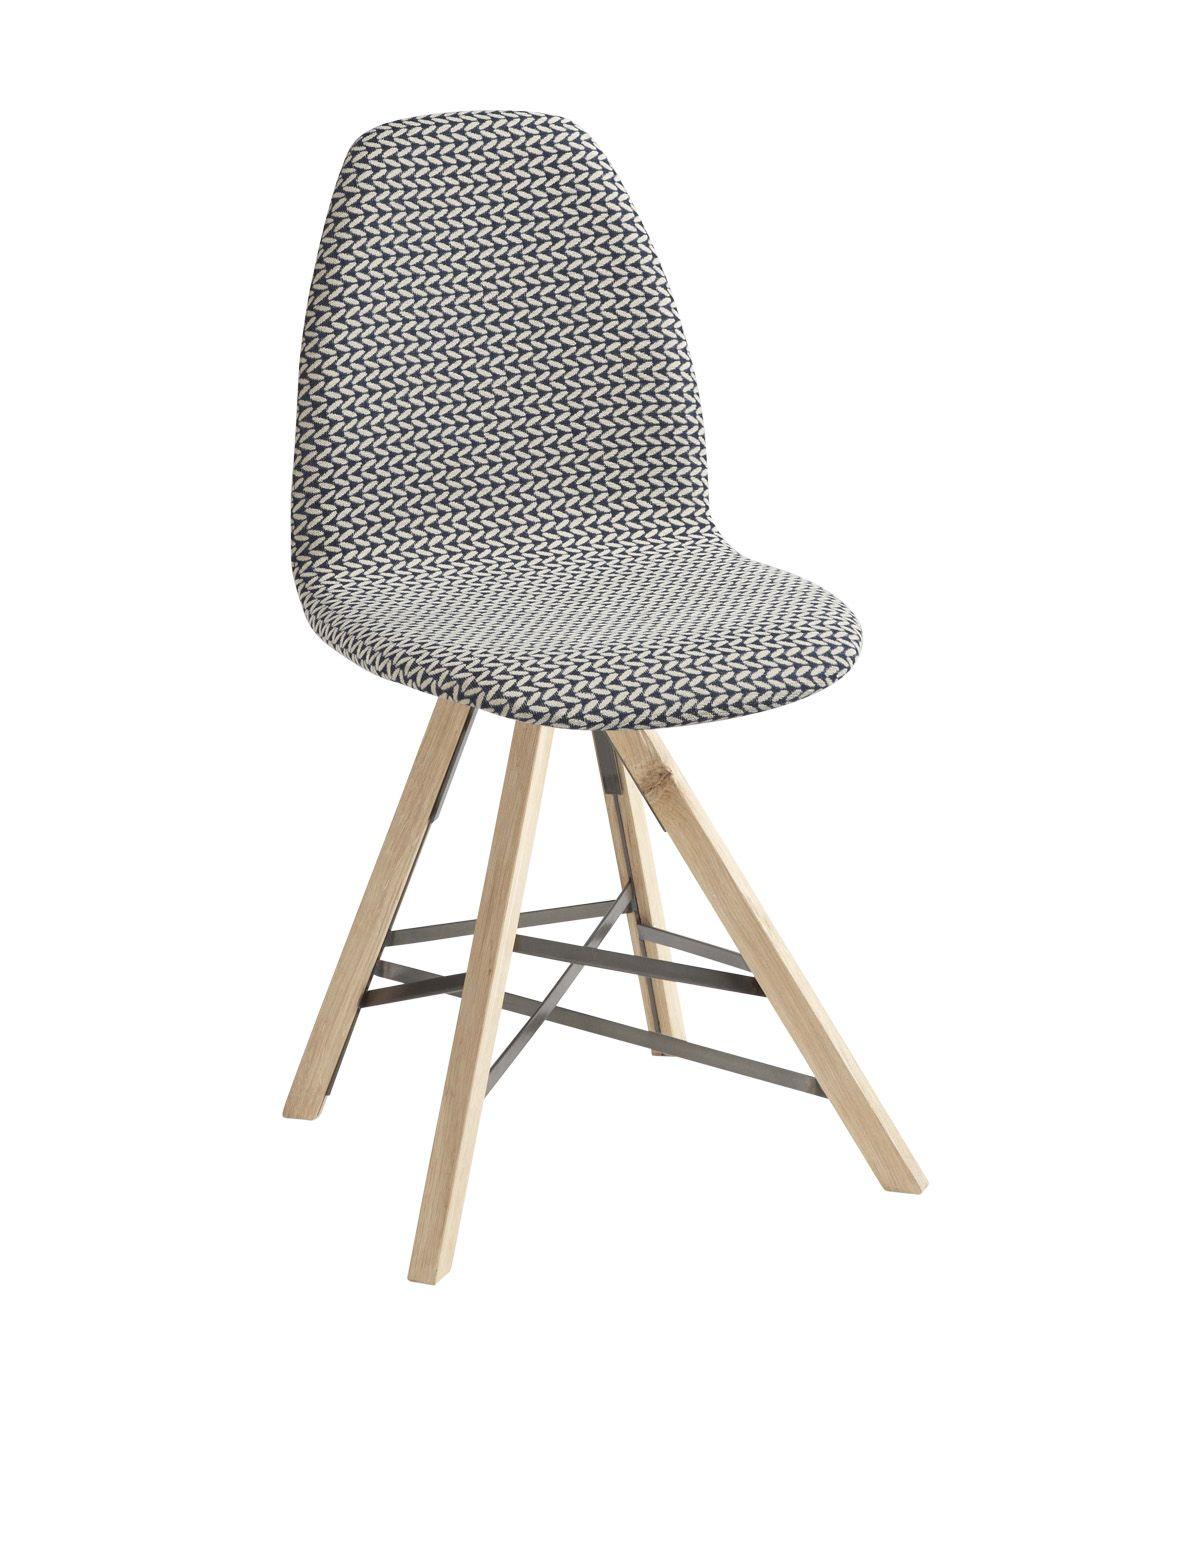 Spoinq stoelen | Interieur, Stoelen, Meubels